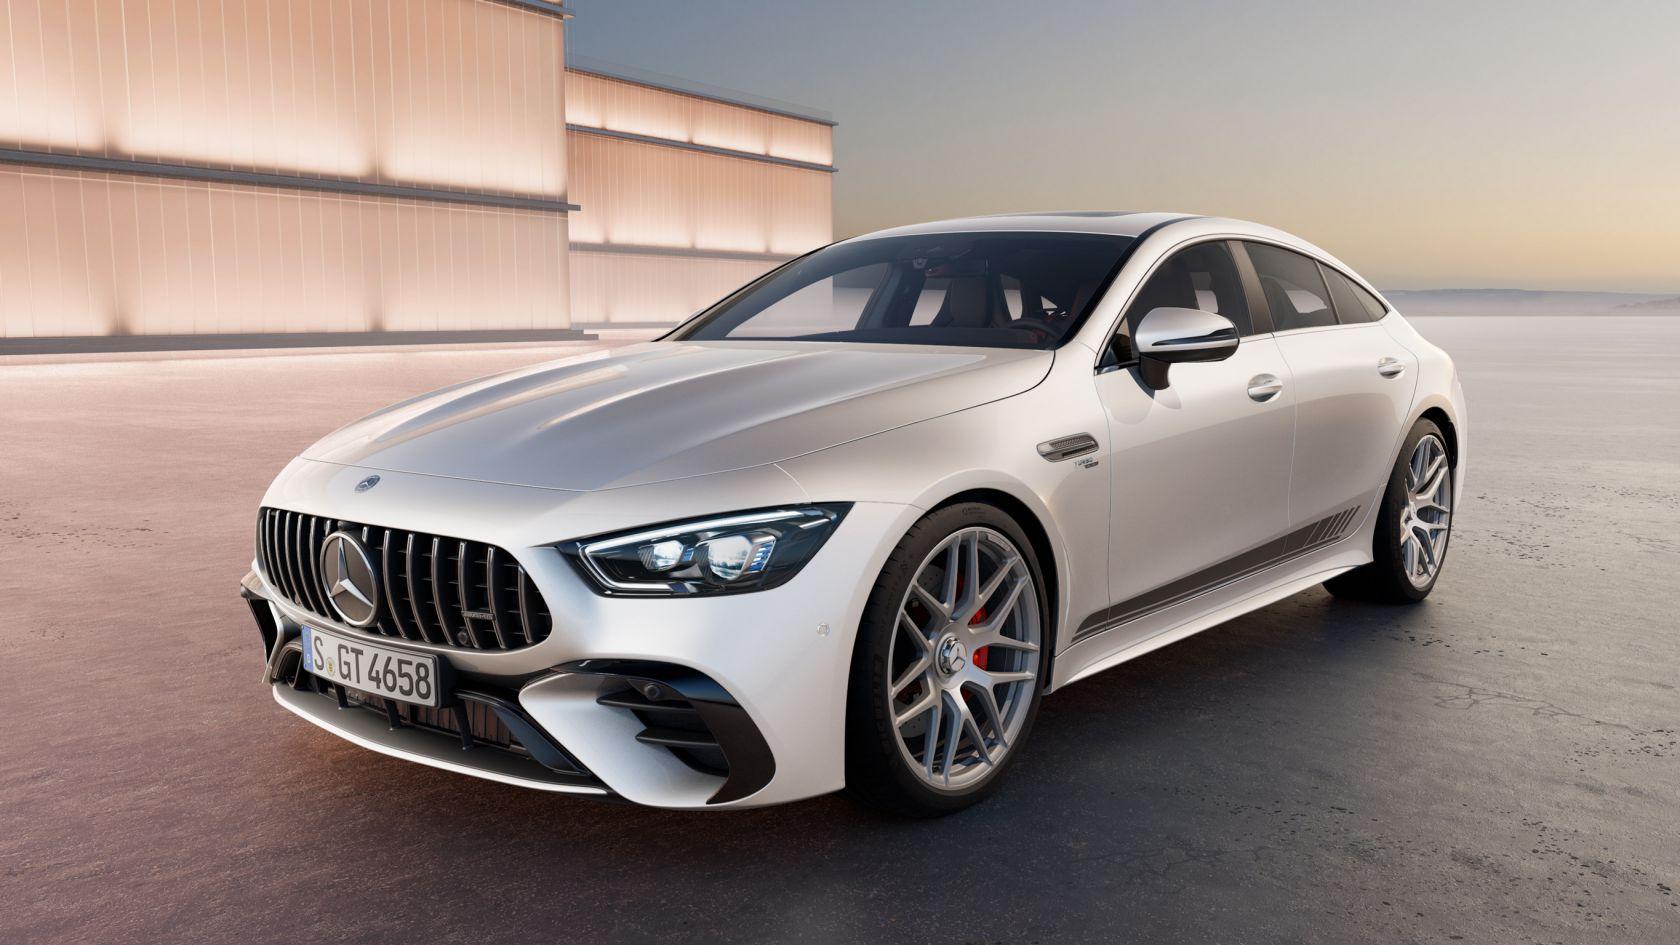 Mercedes-AMG-GT-4-door-coupe-Car-Avenue-03